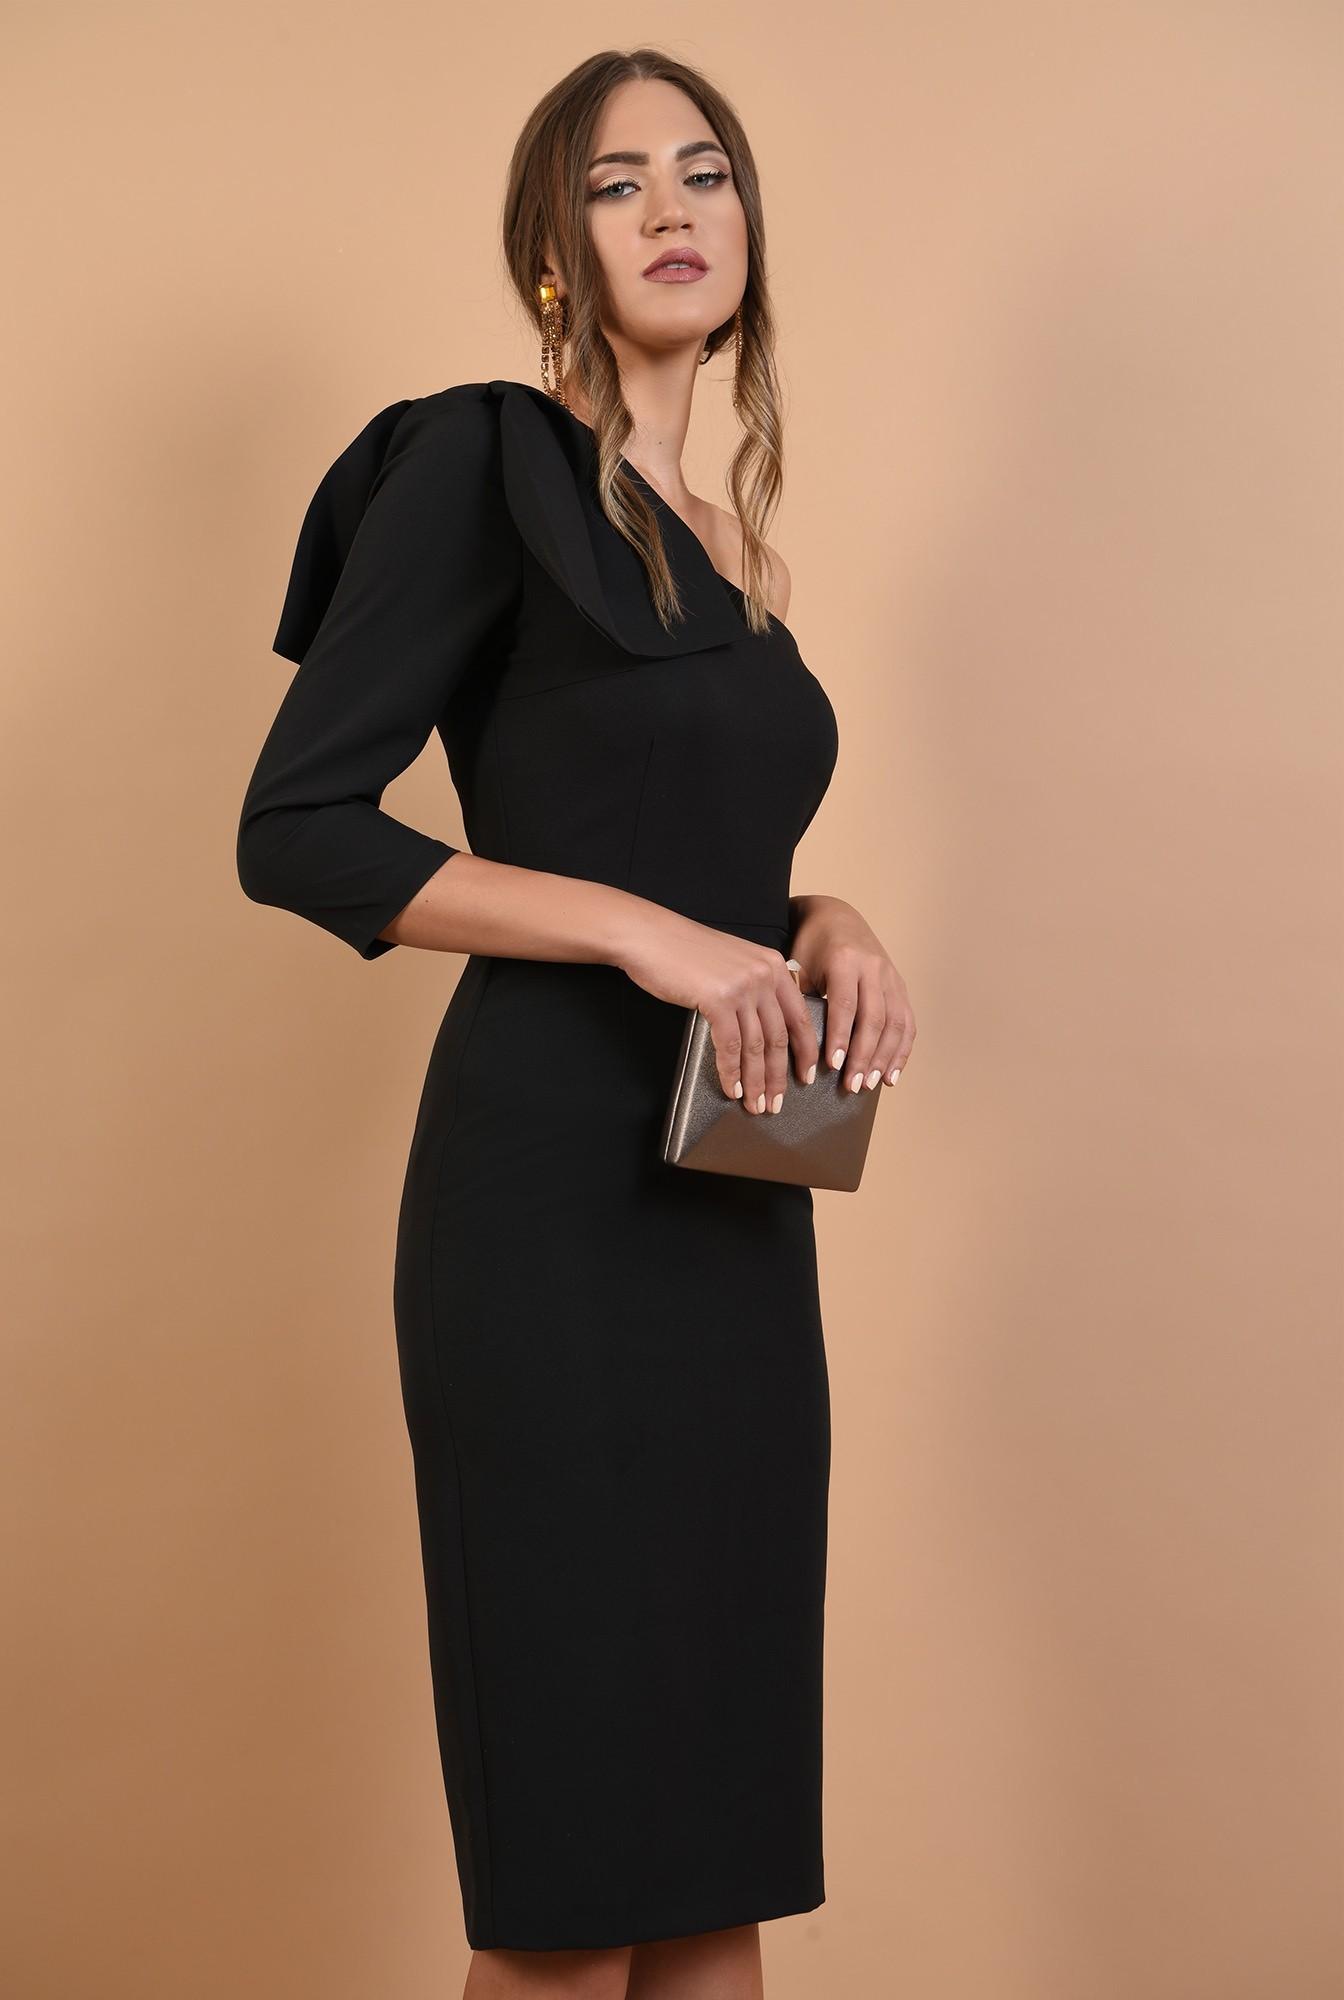 0 - rochie eleganta, cu funda, umar gol, midi